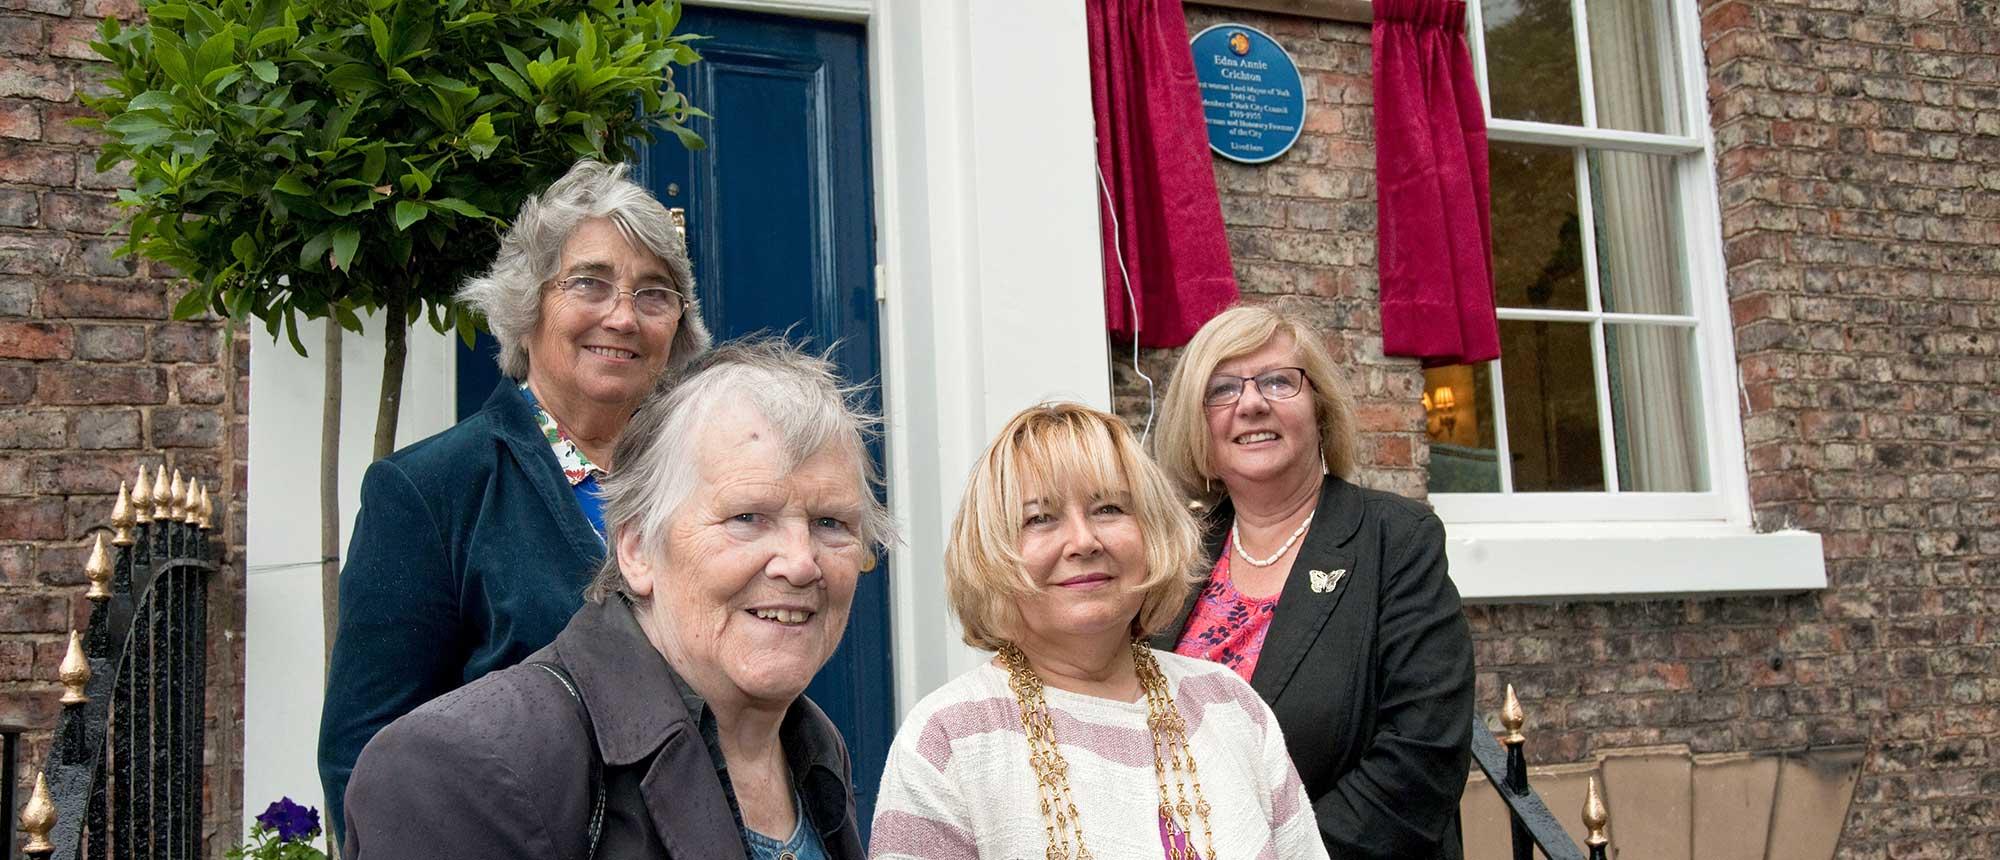 EACrichton Plaque: Four Lady Lord Mayors Hopton Looker Boyce Reid